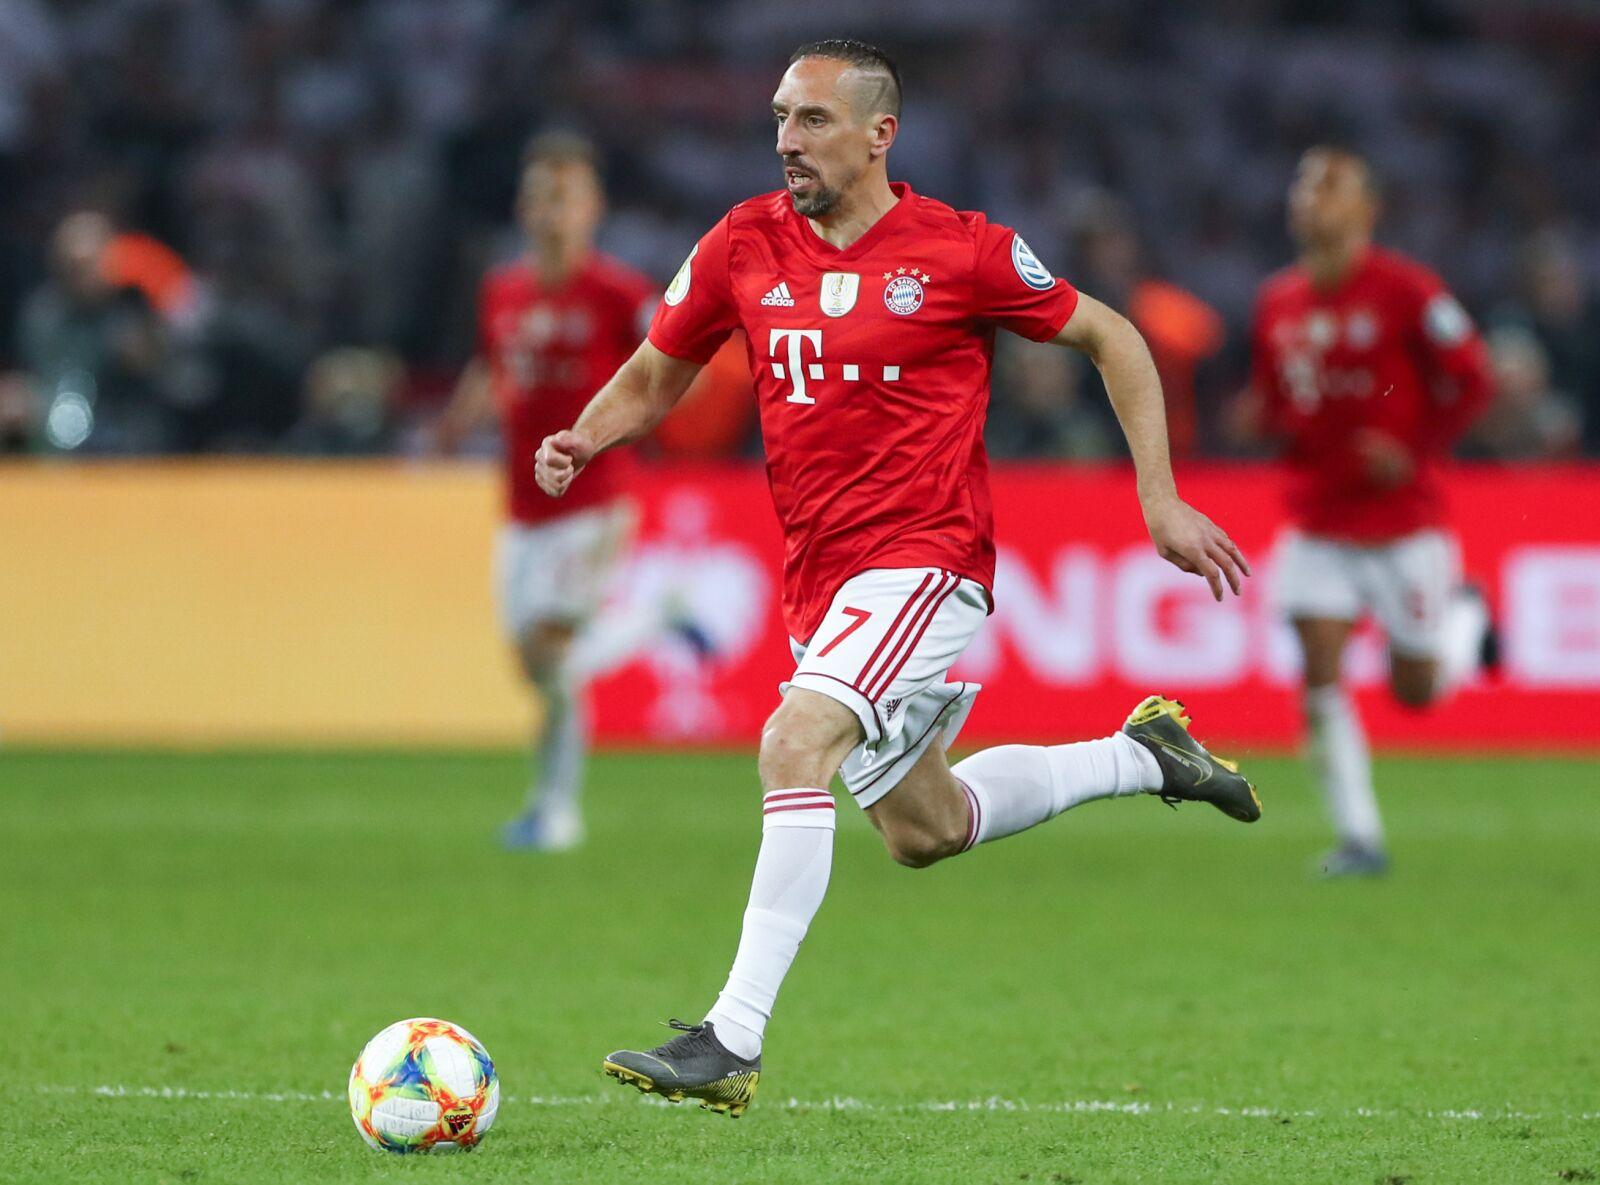 Bayern Munich winger Franck Ribery linked with Sheffield United